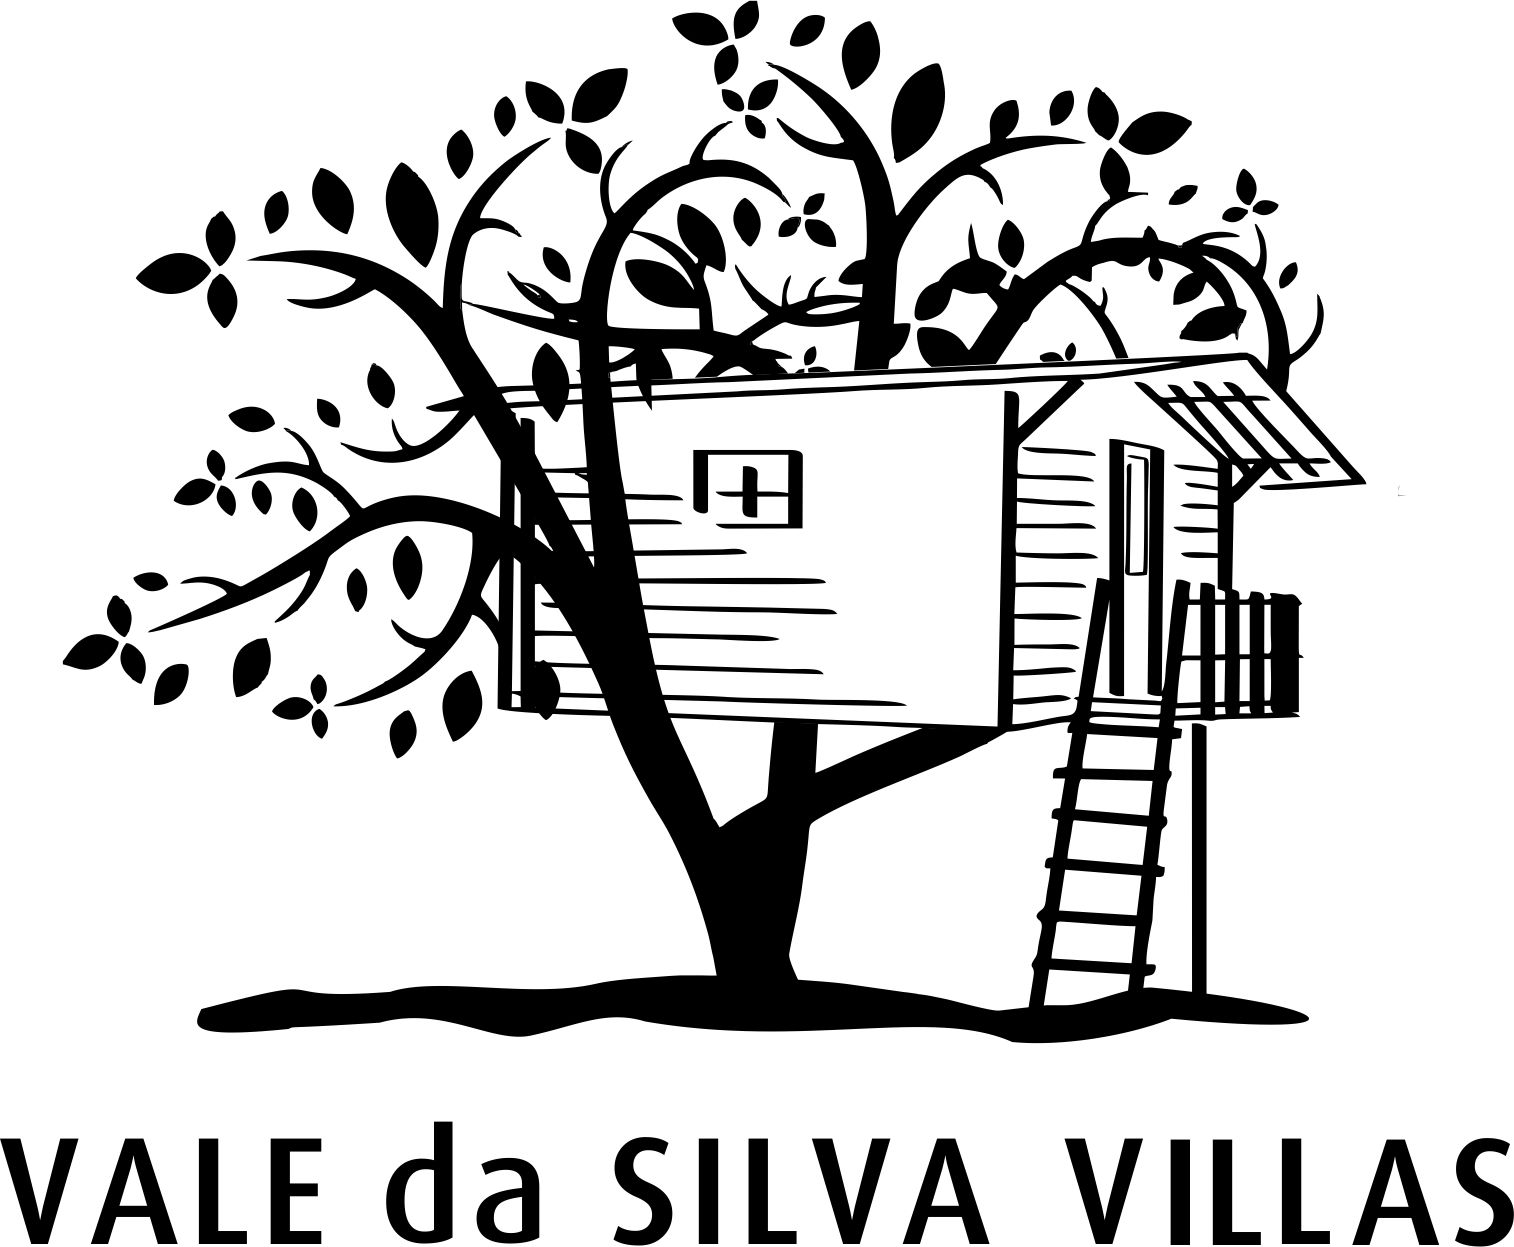 C:\Users\Afonso Paiva\AppData\Local\Microsoft\Windows\INetCache\Content.Word\VALE DA SILVA VILLAS.JPG